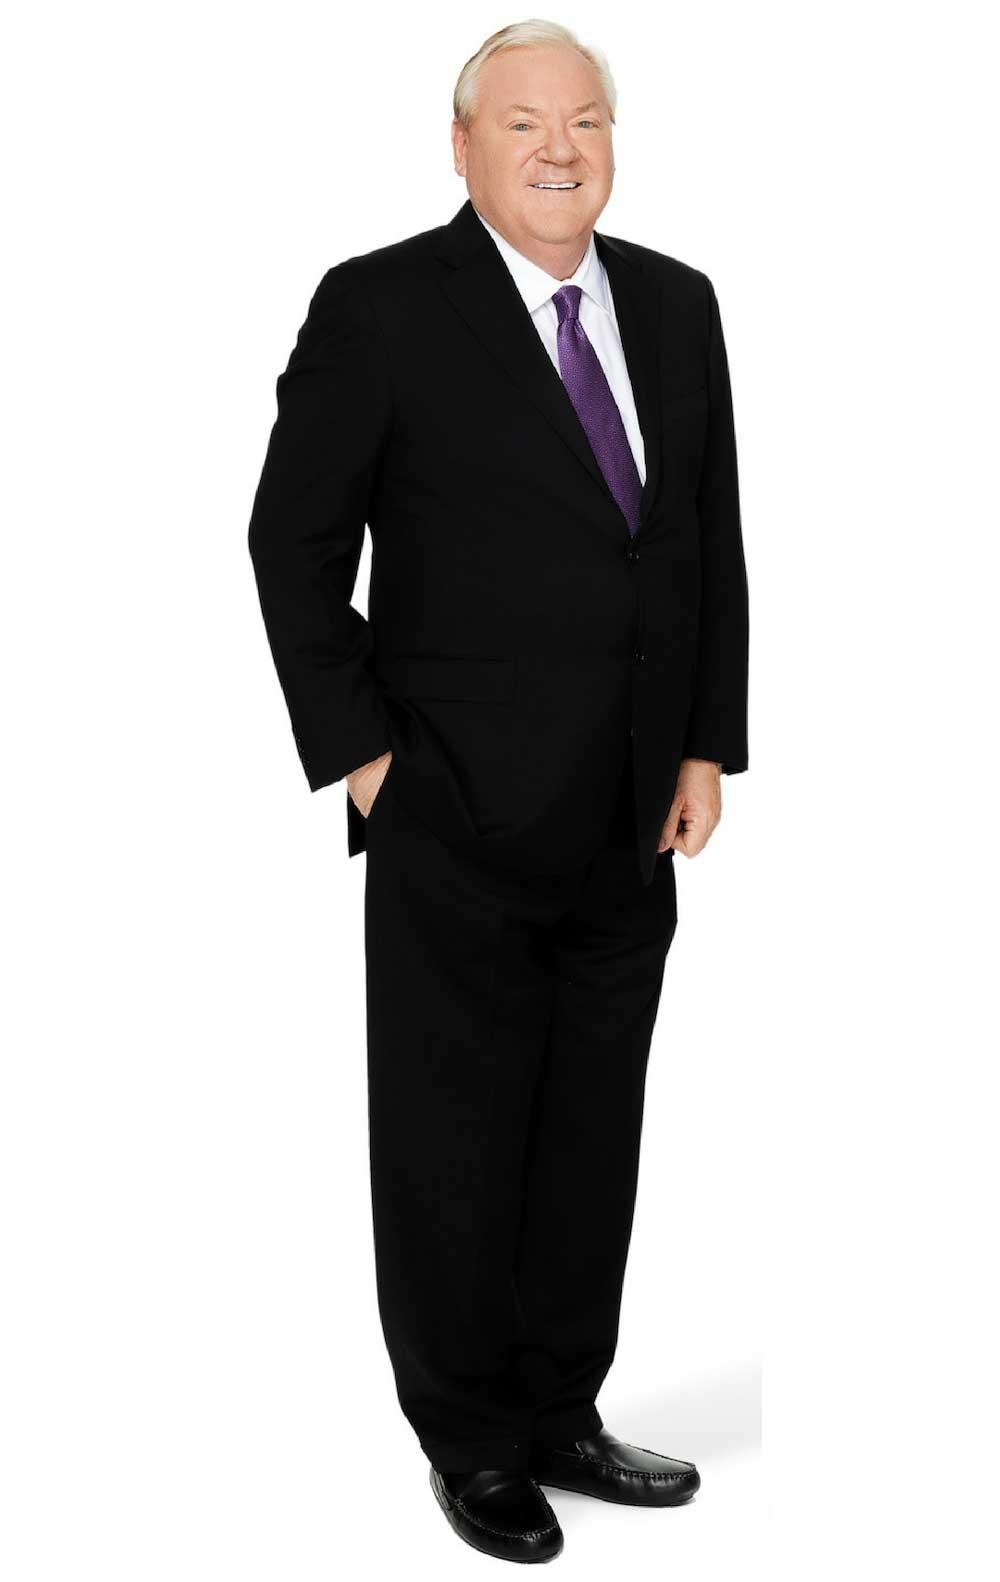 Kevin M Buckley - Broker Managing Member